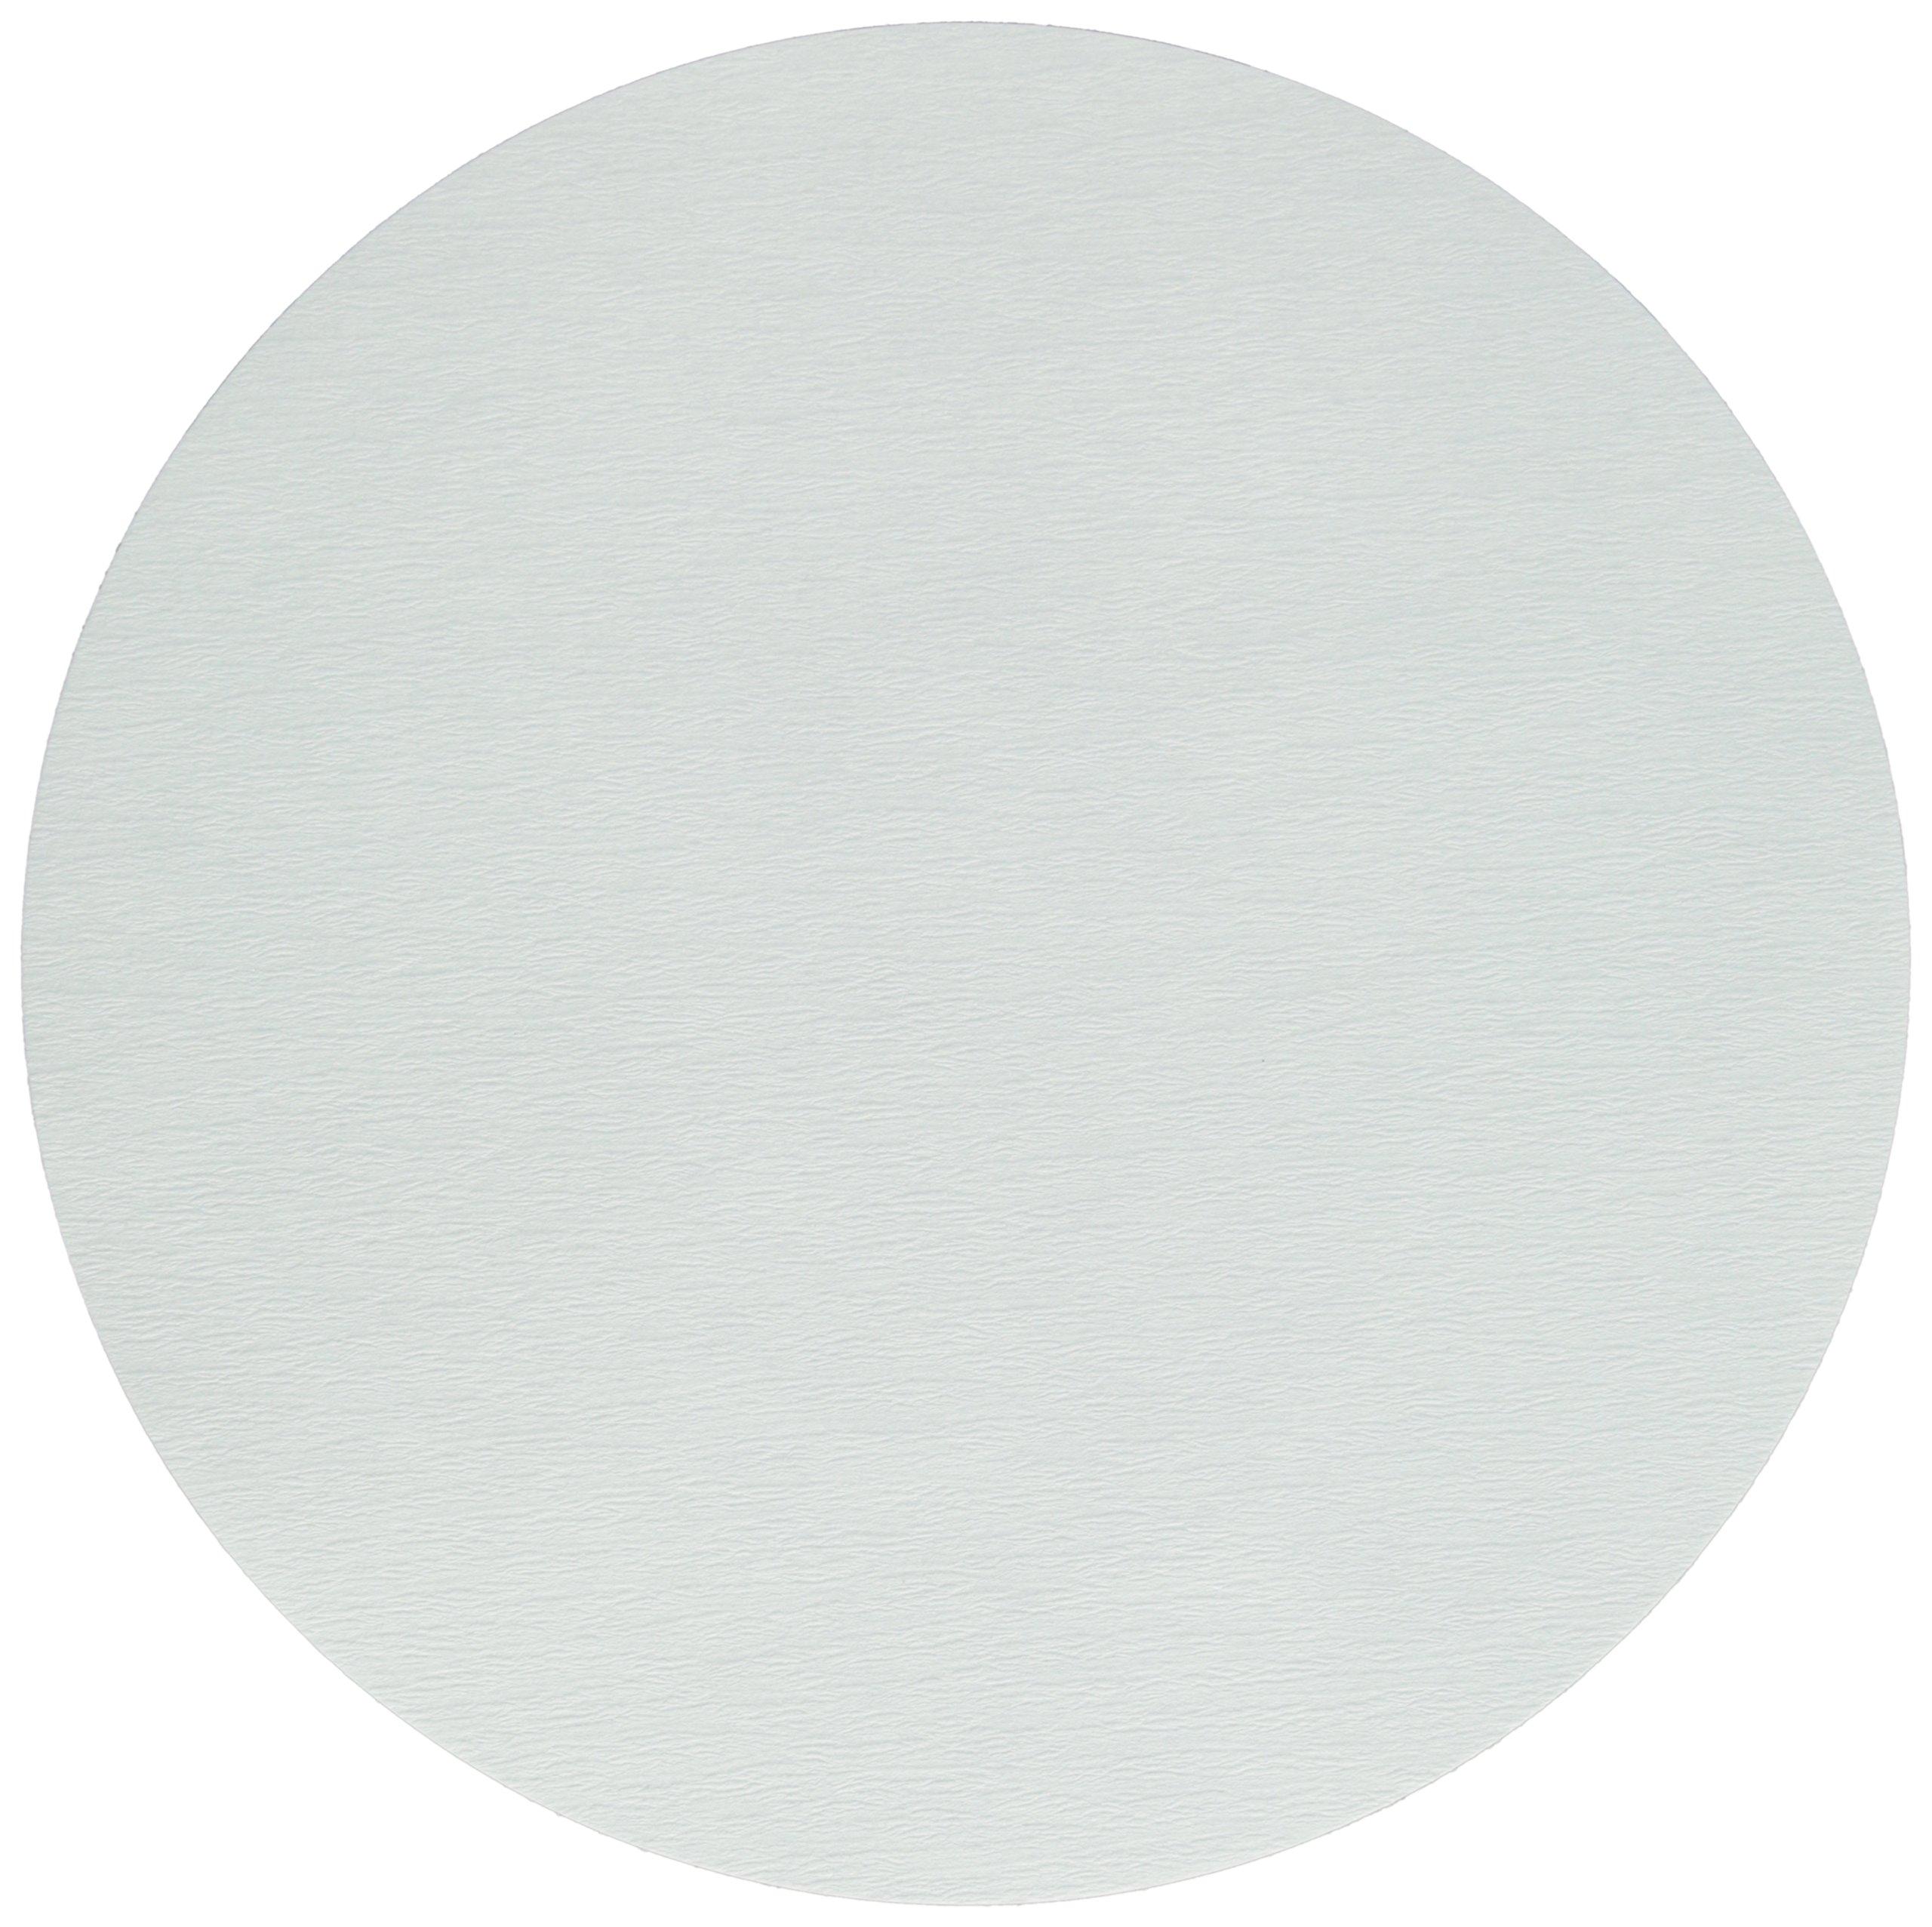 GE Whatman Reeve Angel 5202-250 Qualitative Filter Paper, Circle, Crepe Surface, Medium-Fast Speed, Grade 202, 25cm Diameter (Pack of 100) by Whatman (Image #1)